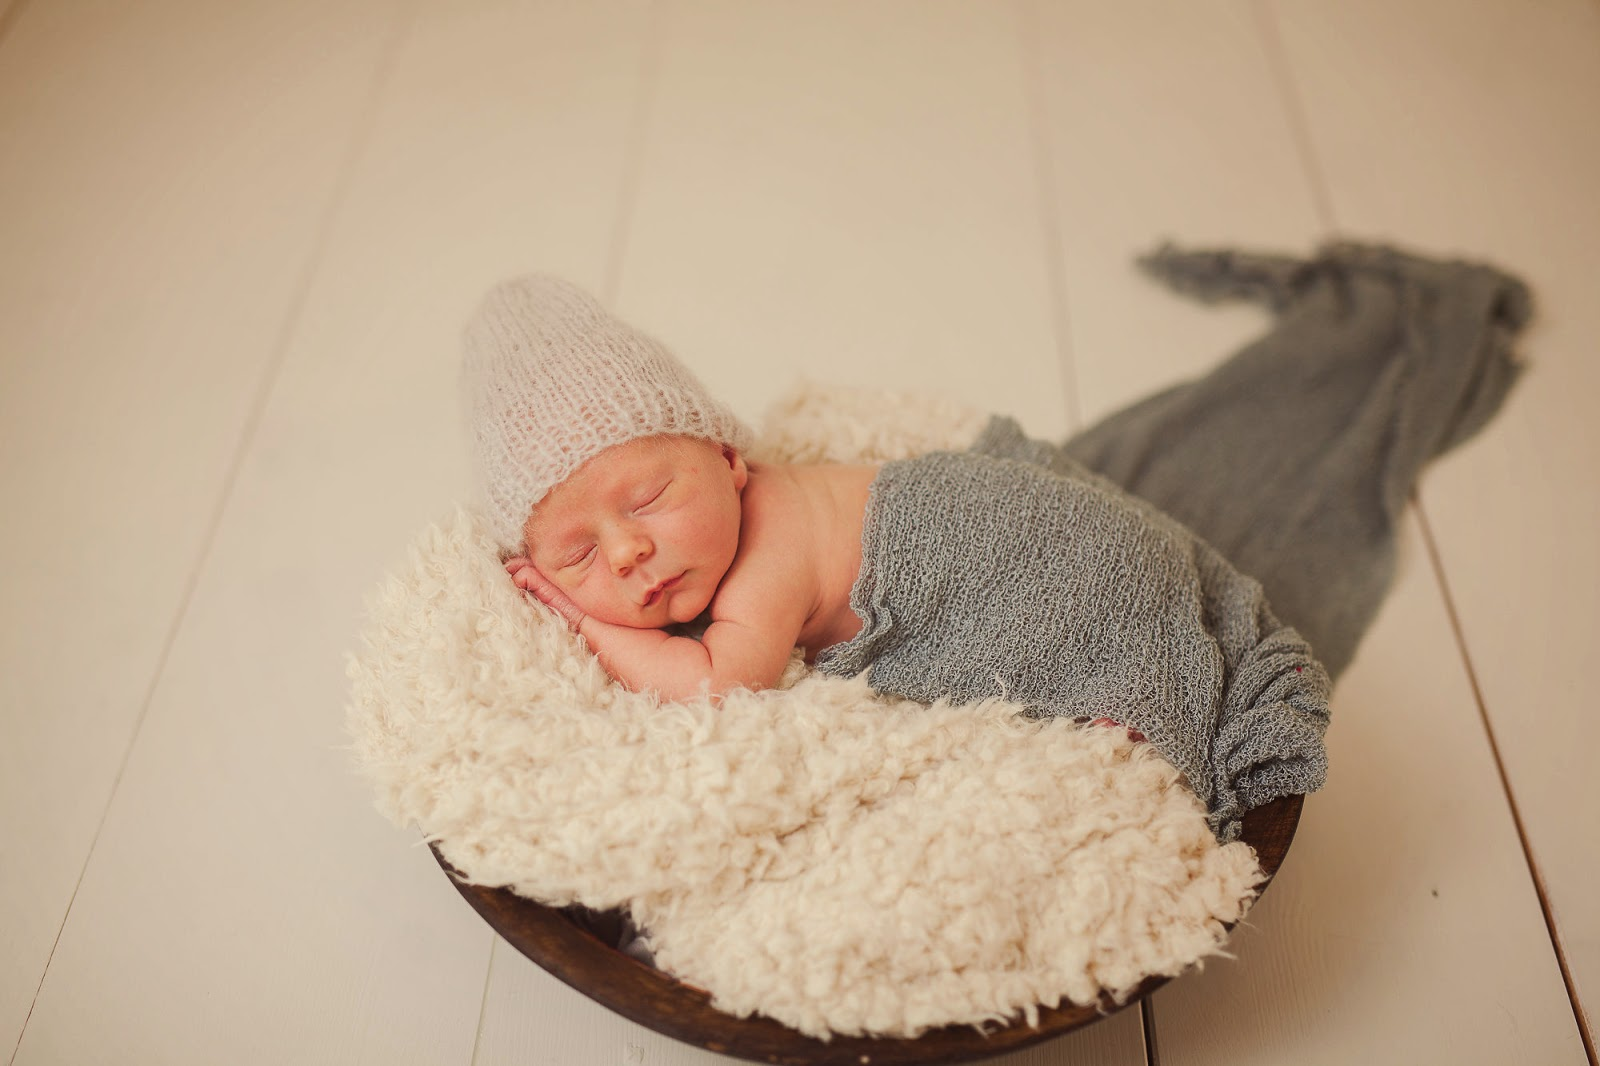 1108fotograftanjamyrbratennyfødtfotografering-2355